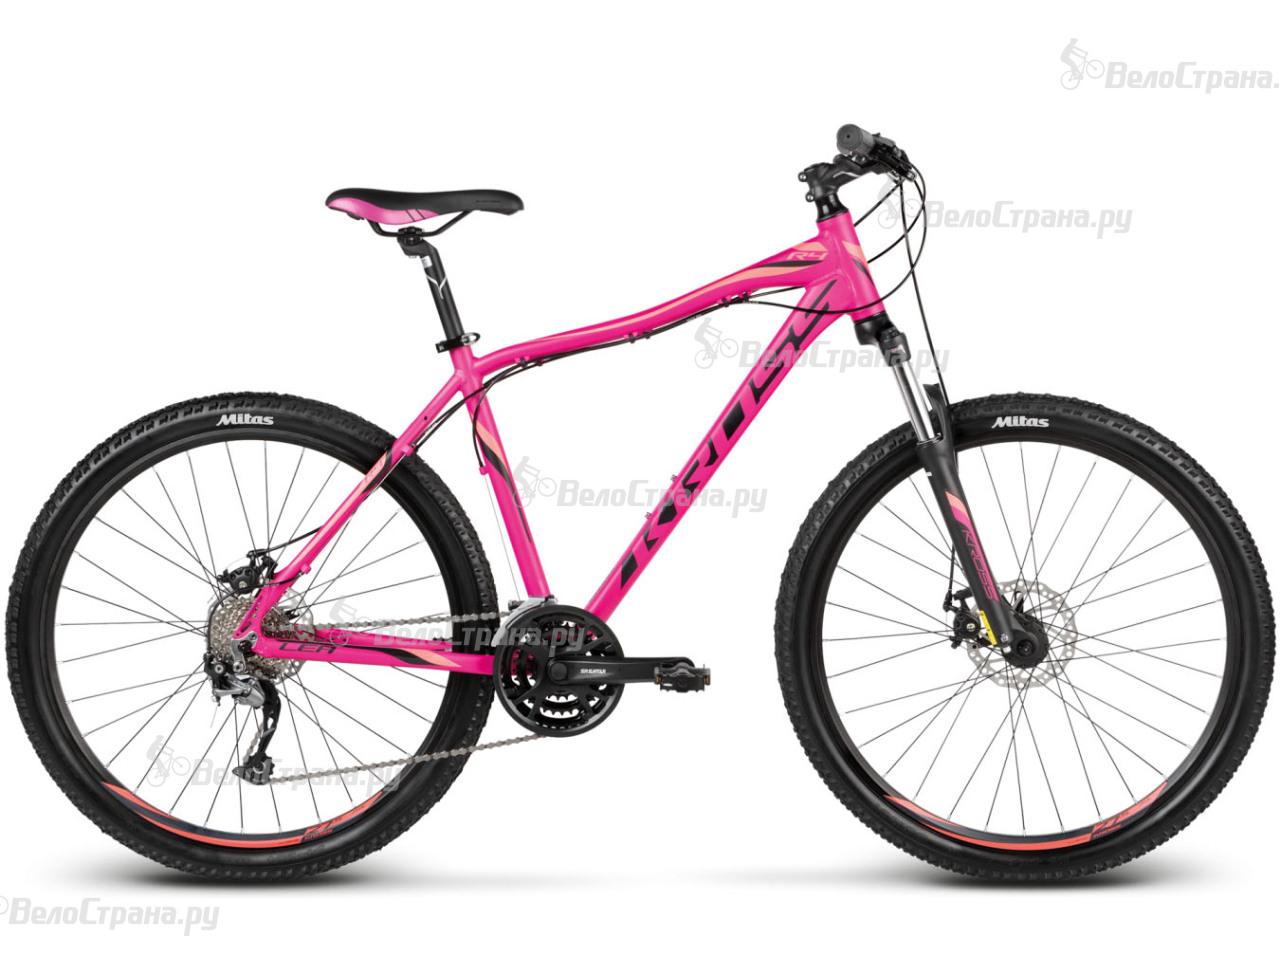 Велосипед Kross Lea R4 (2017) r4 5a